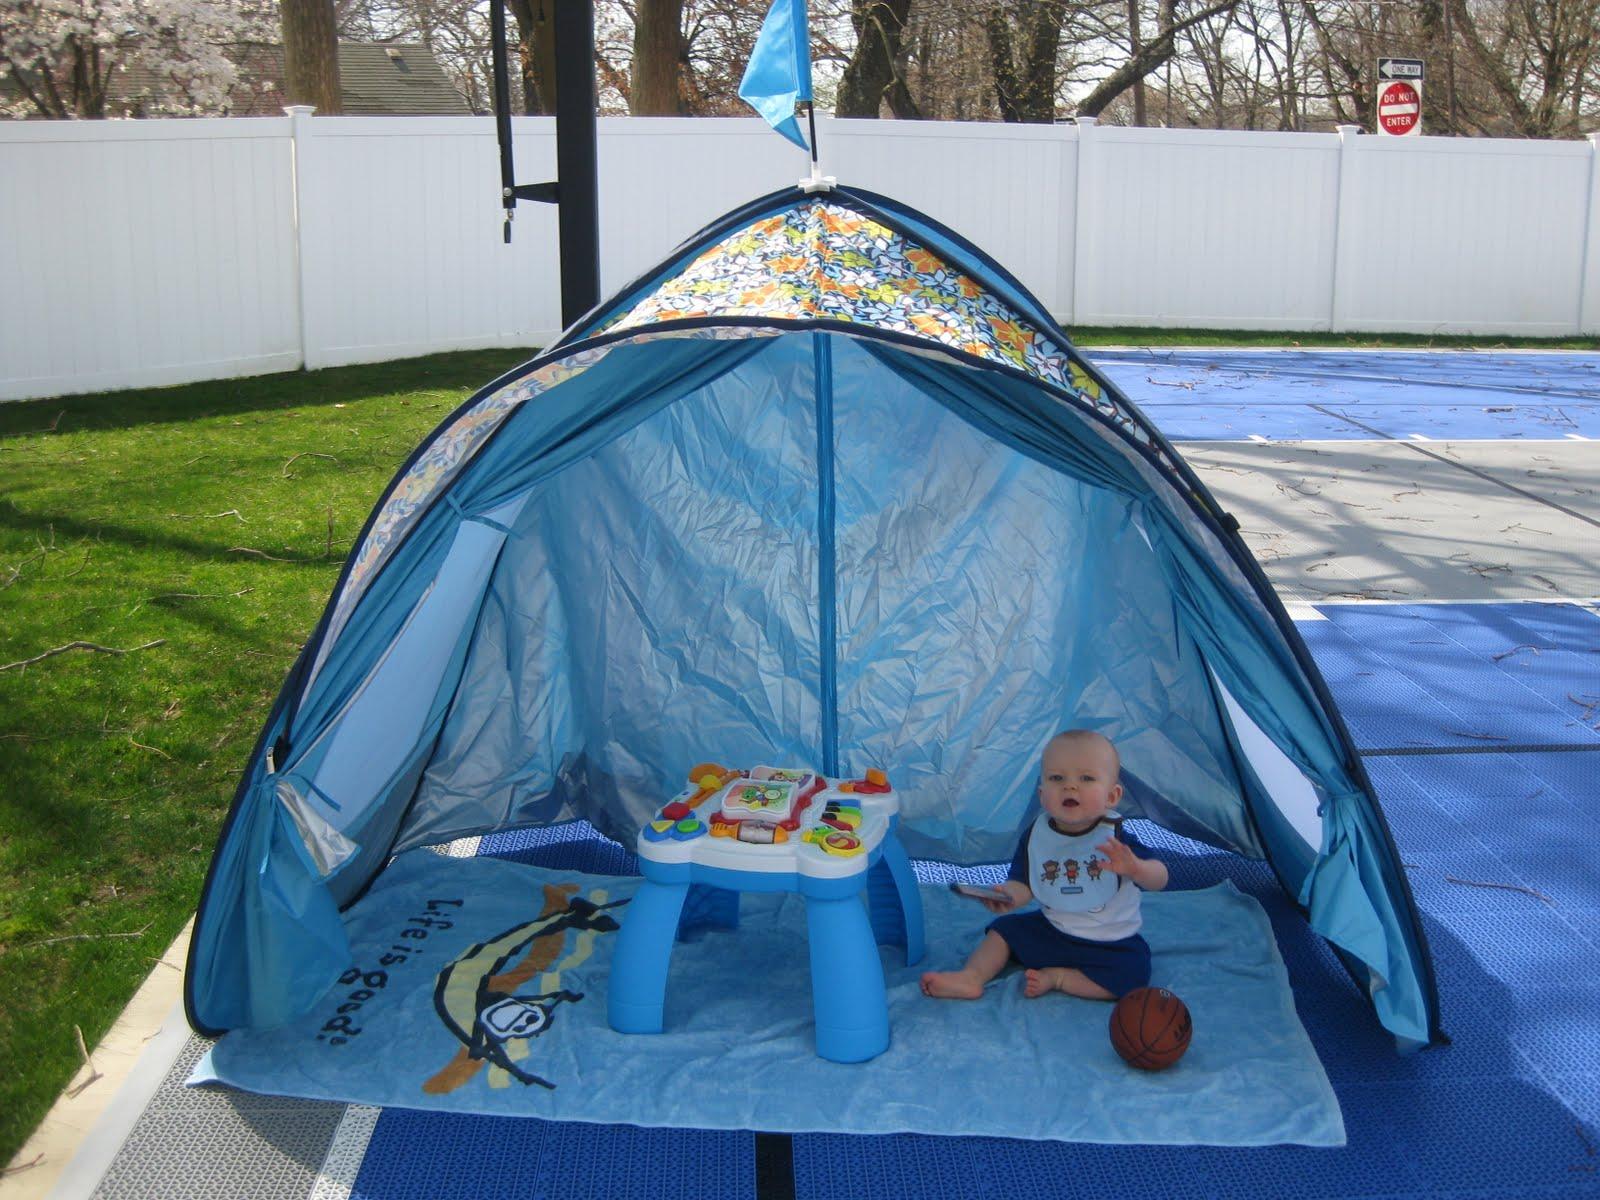 Friday Favorite Sun Smarties Family Beach Cabana Tent & TryItMom: Friday Favorite: Sun Smarties Family Beach Cabana Tent